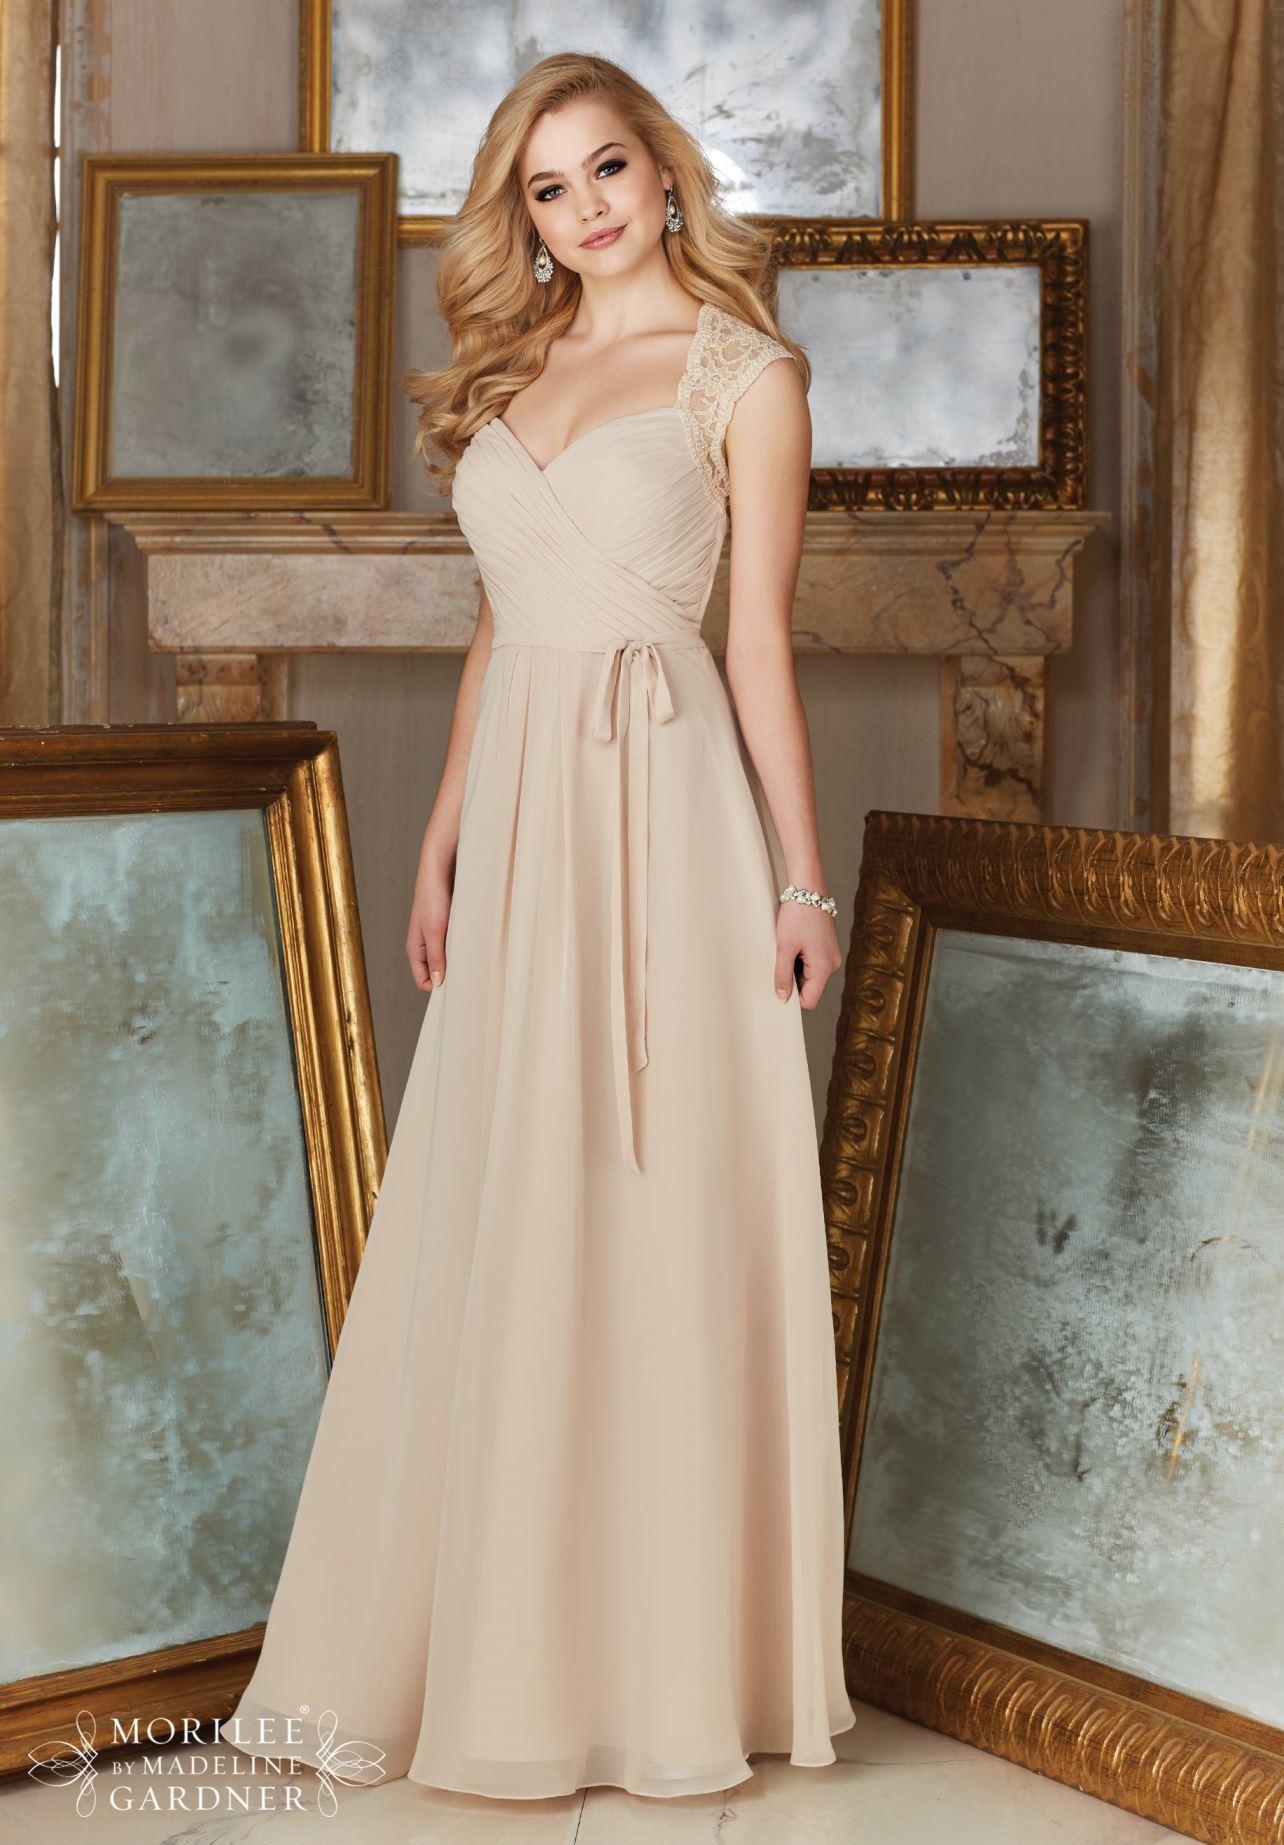 Dress Mori Lee Bridesmaids Fall 2016 Collection 145